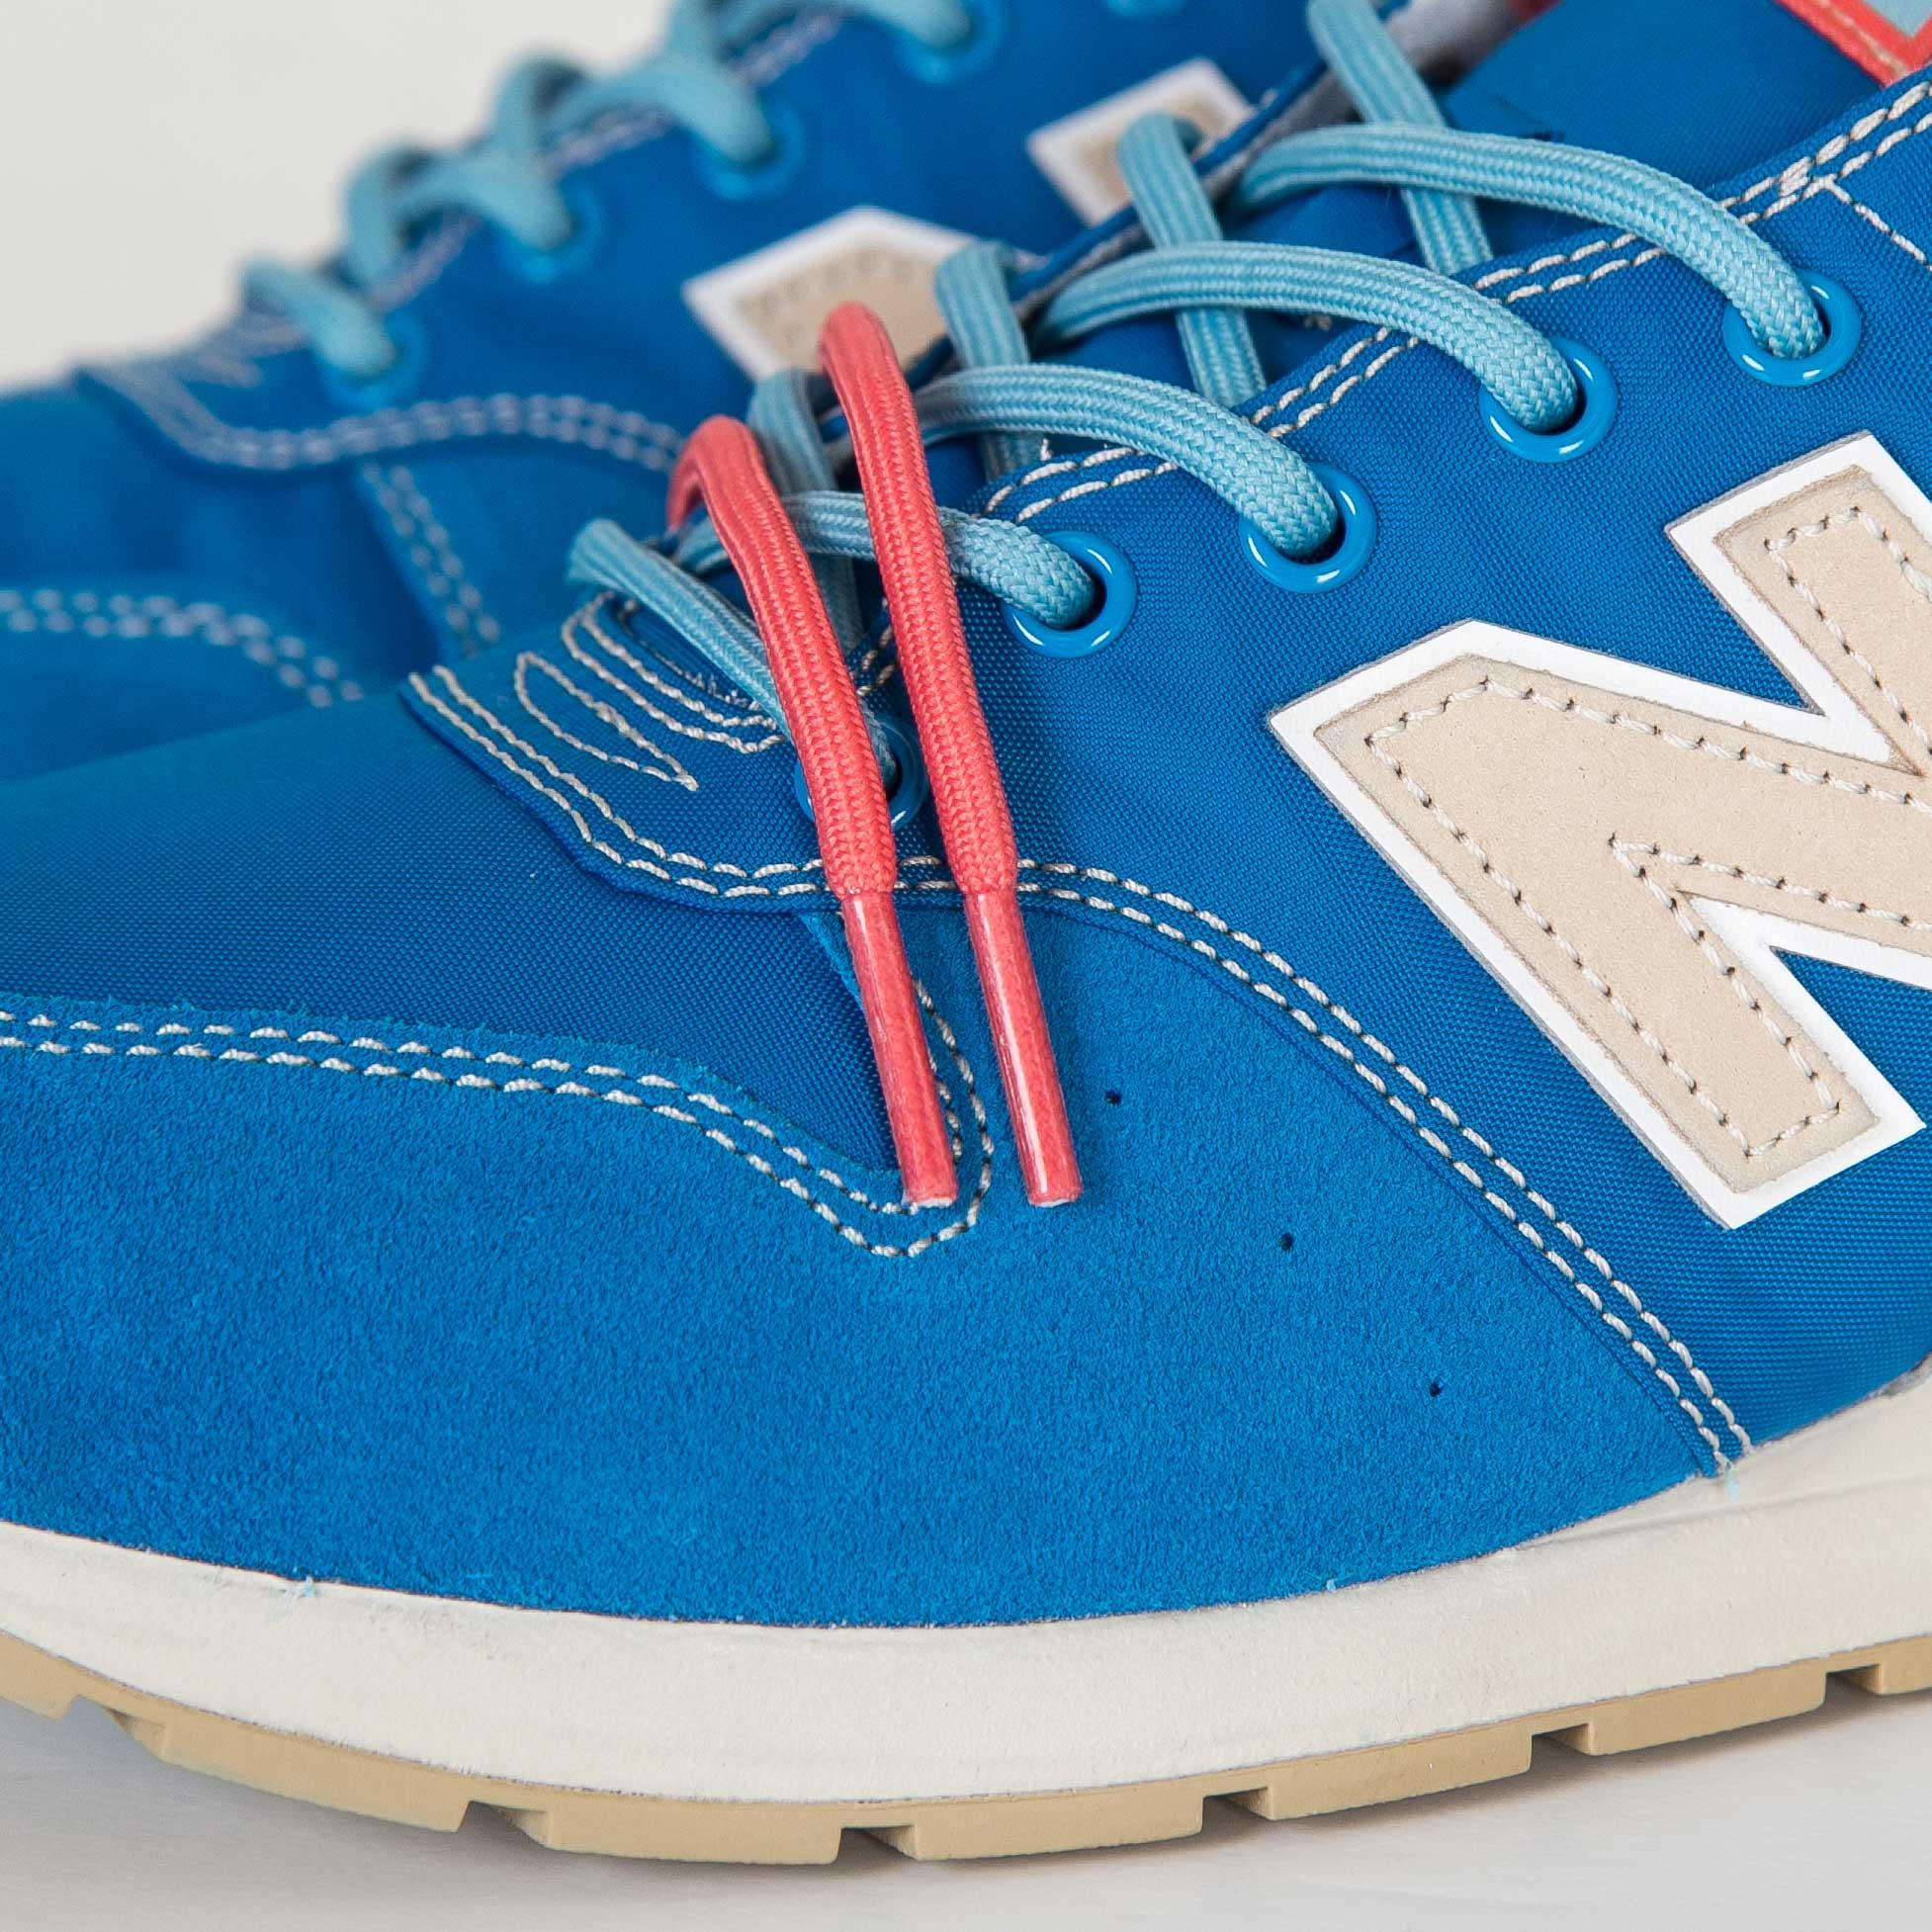 New Balance MRL996 - Mrl996ga - SNS | sneakers & streetwear online ...